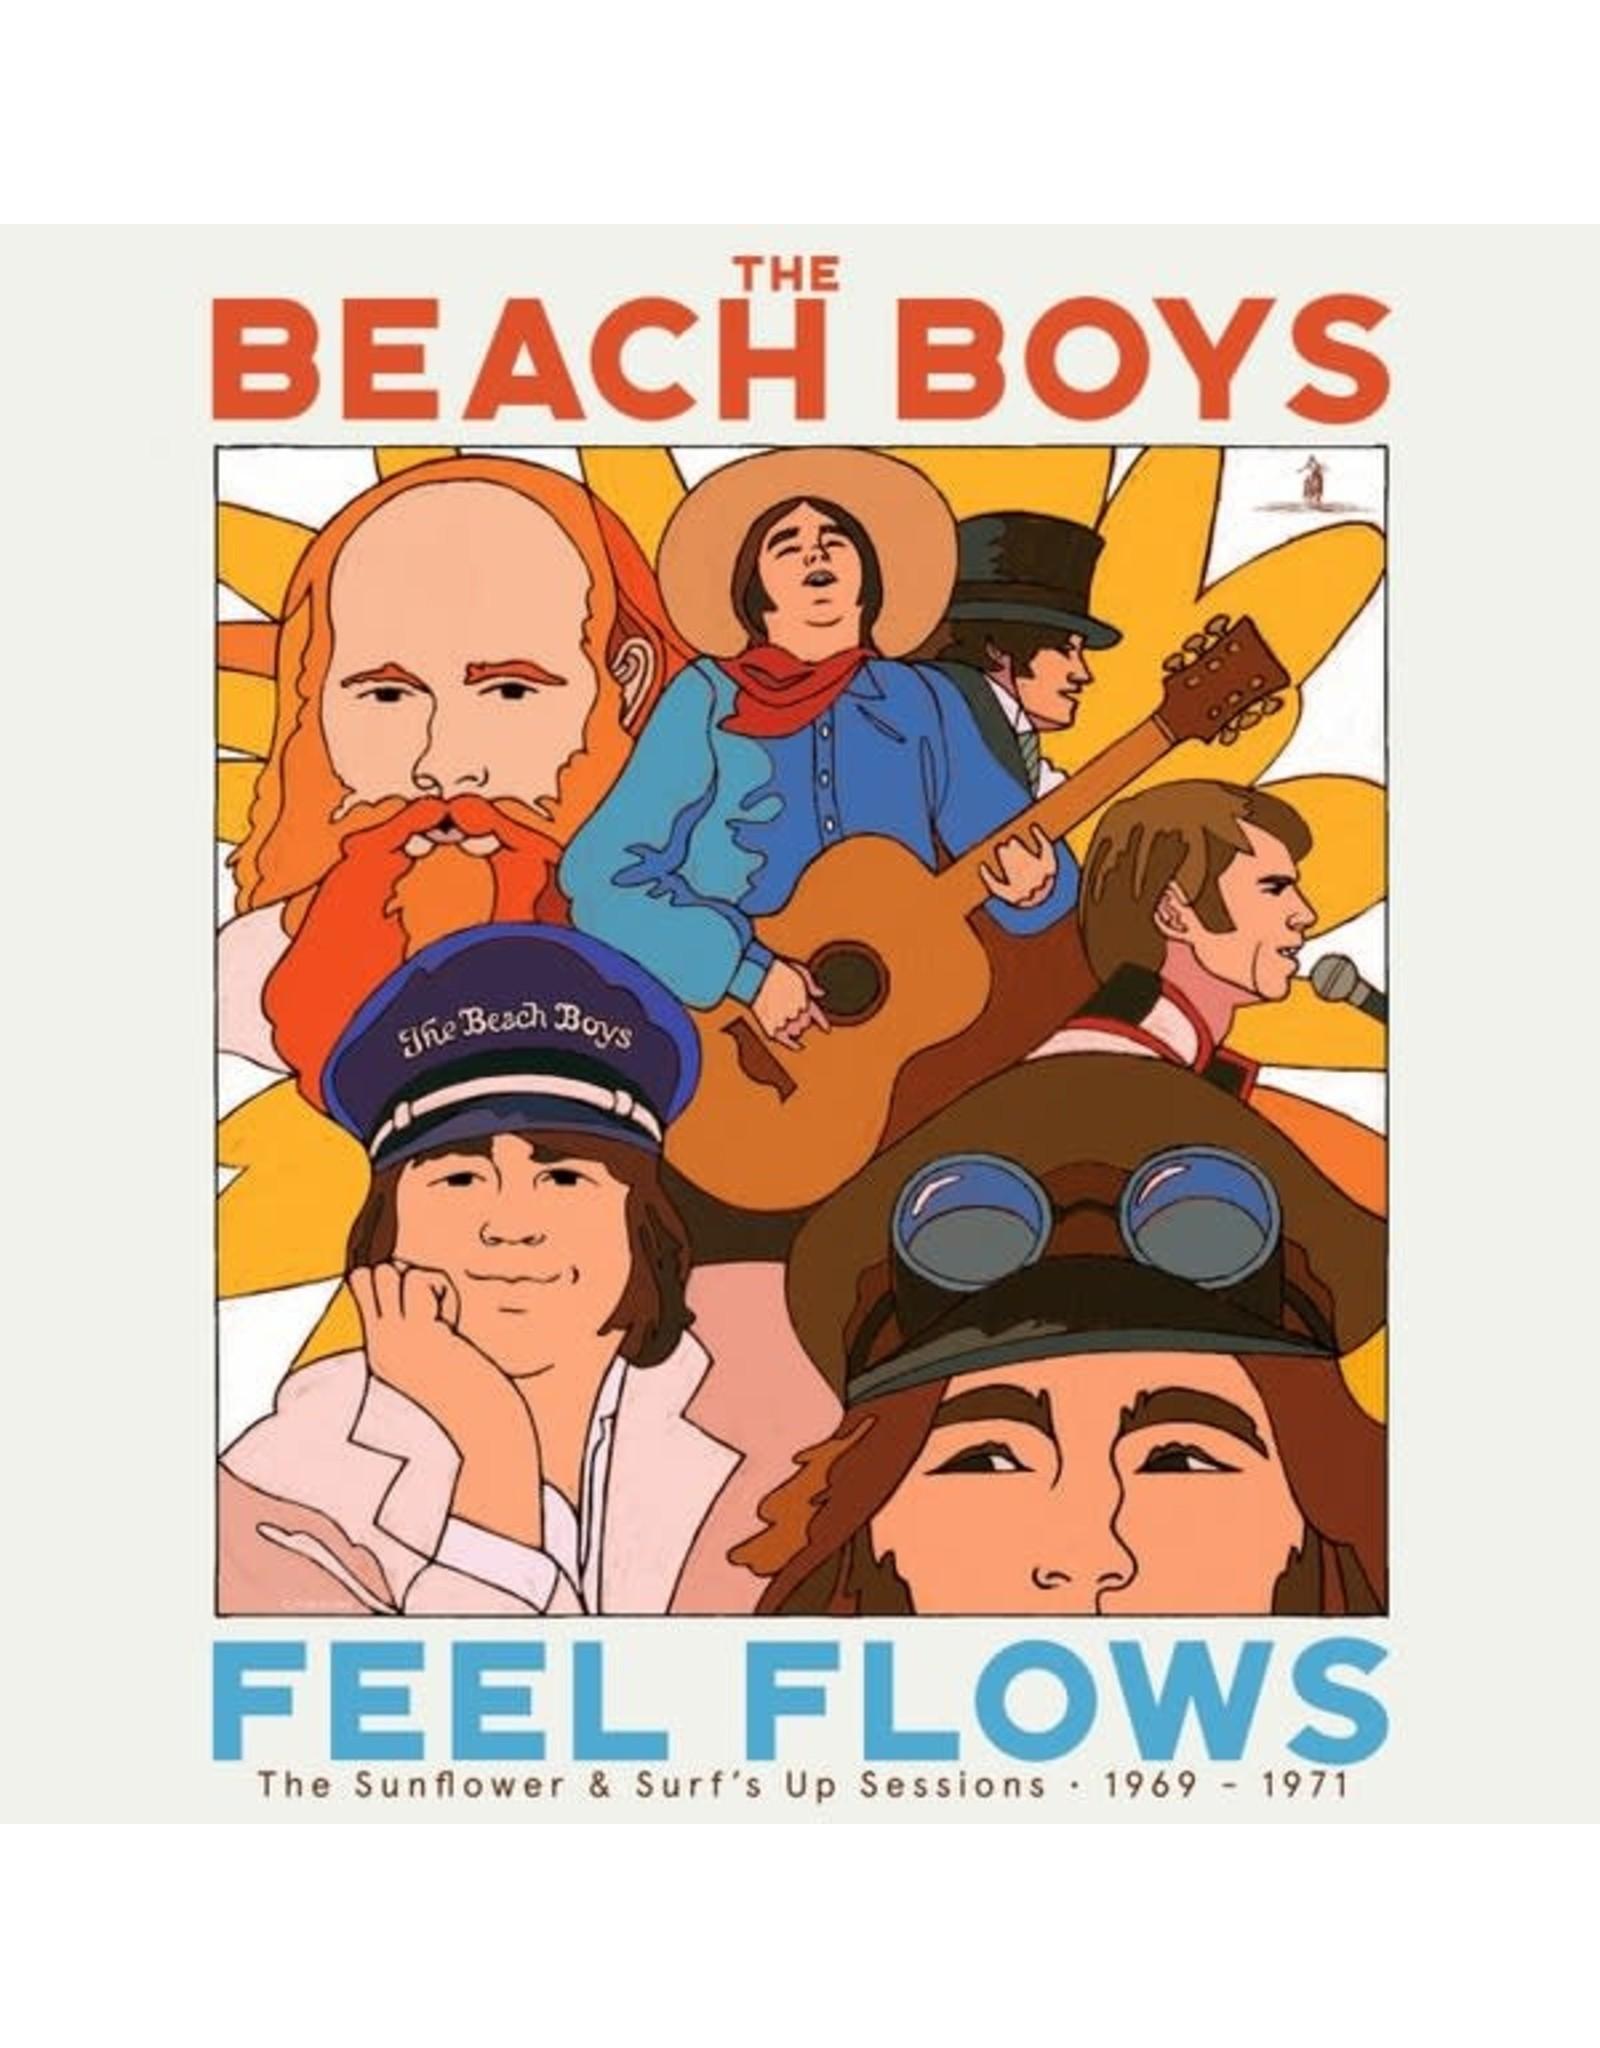 Beach Boys - Feel Flows: The Sunflower & Surf's Up Sessions 1969-1971 (2LP/black)